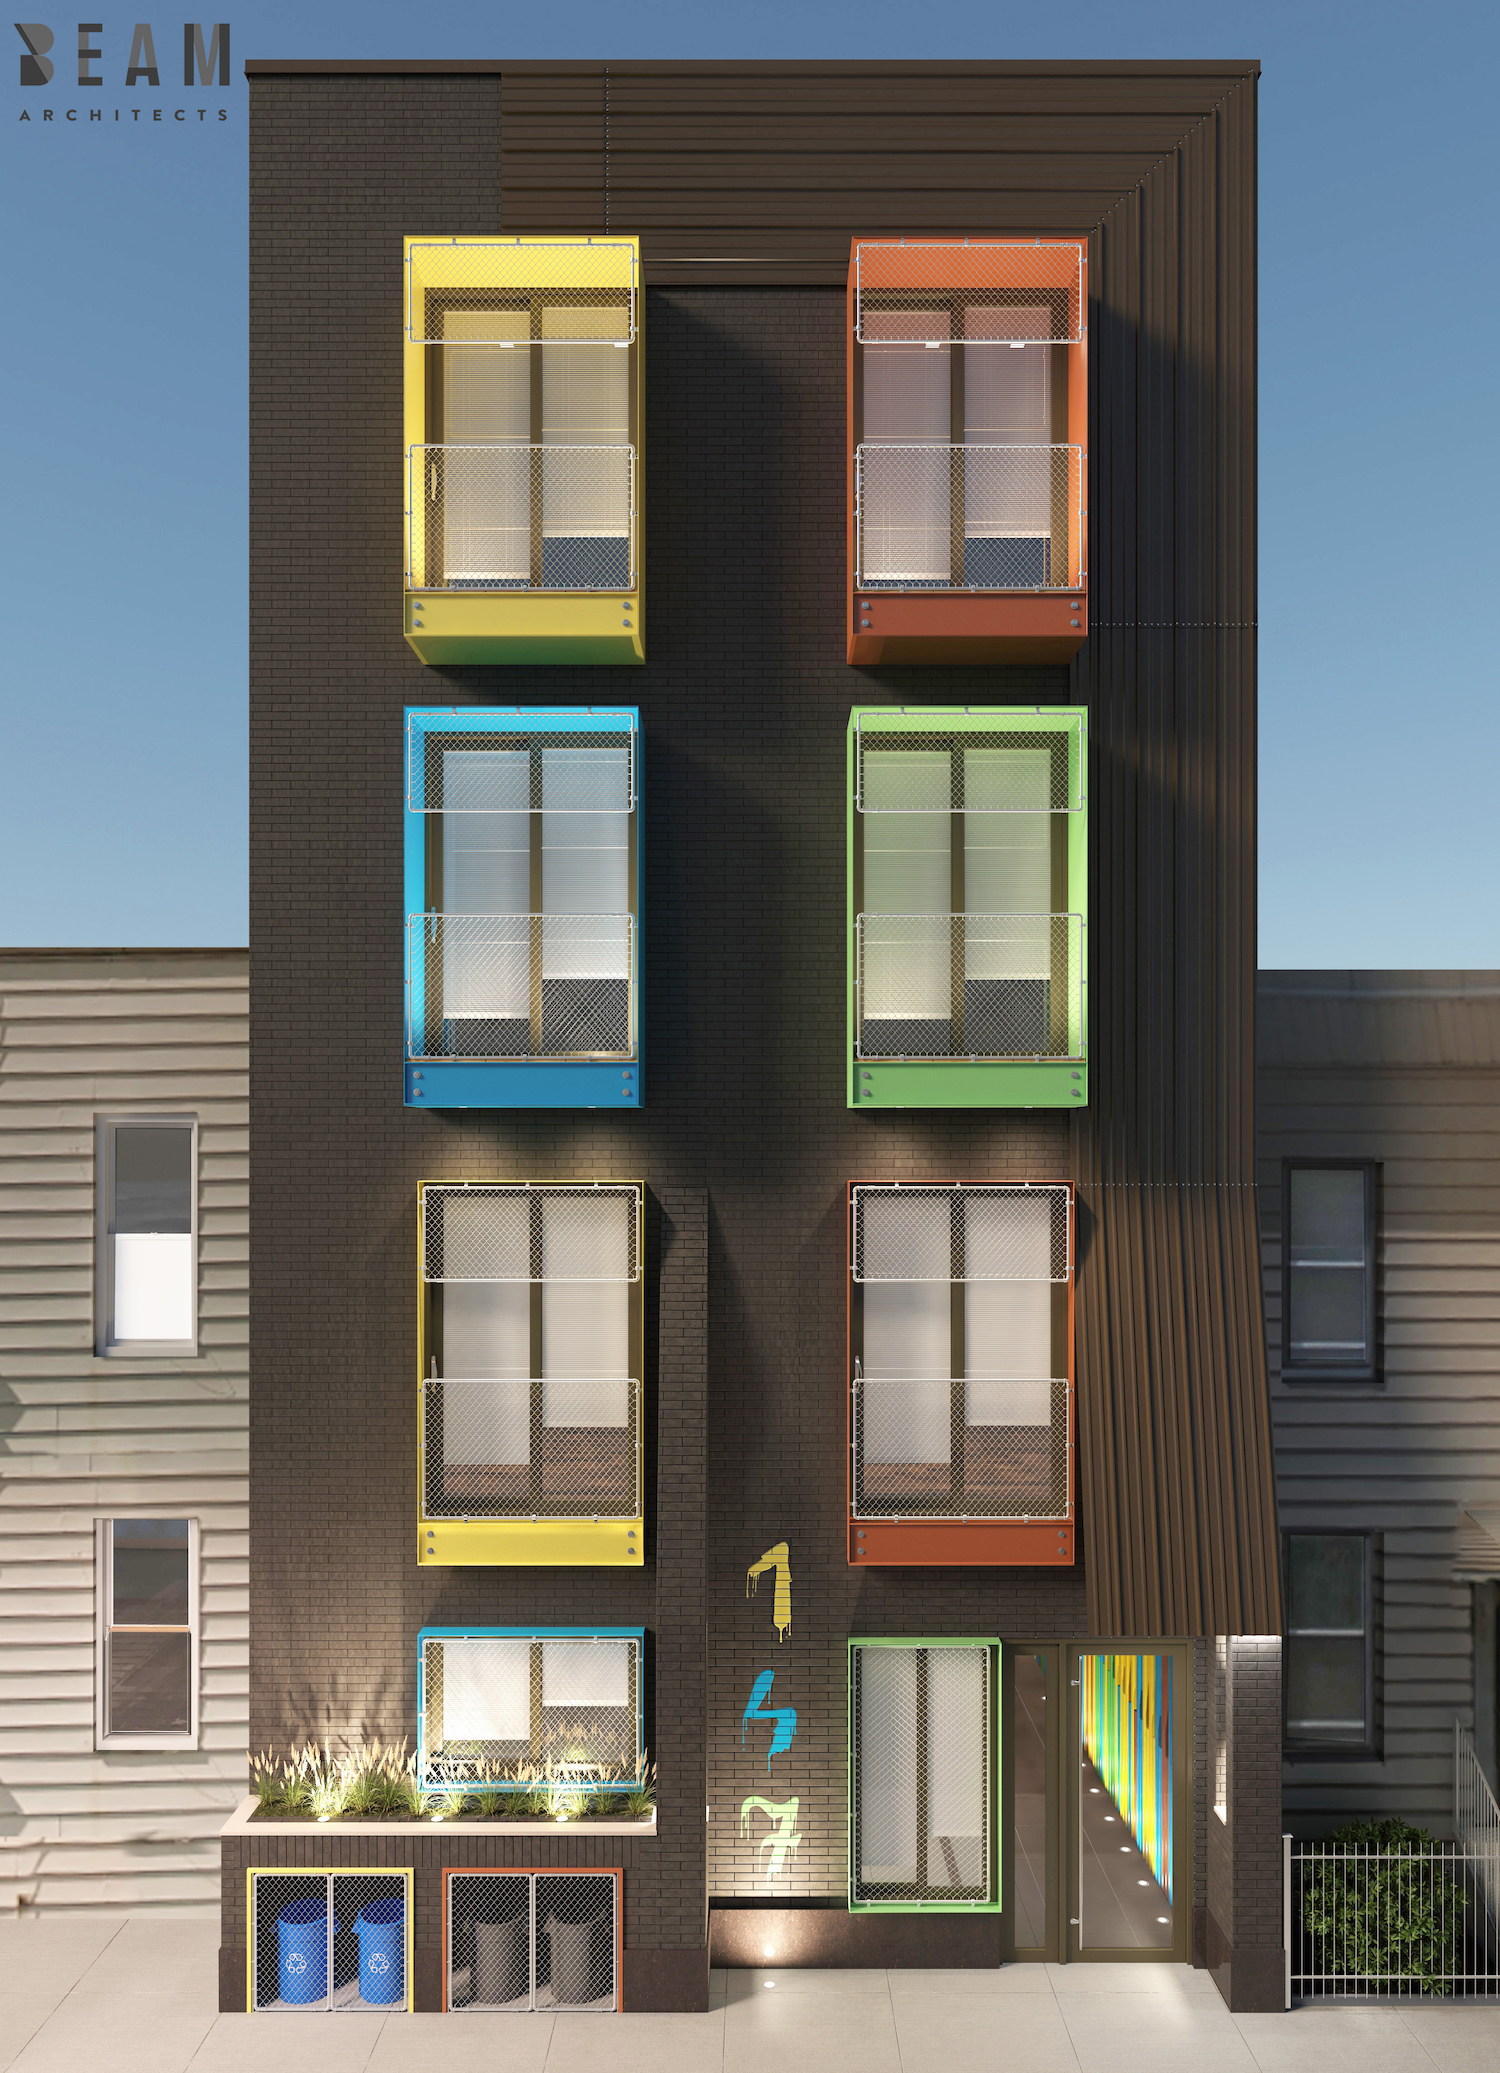 147 Stanhope Street, Brooklyn - Beam Group